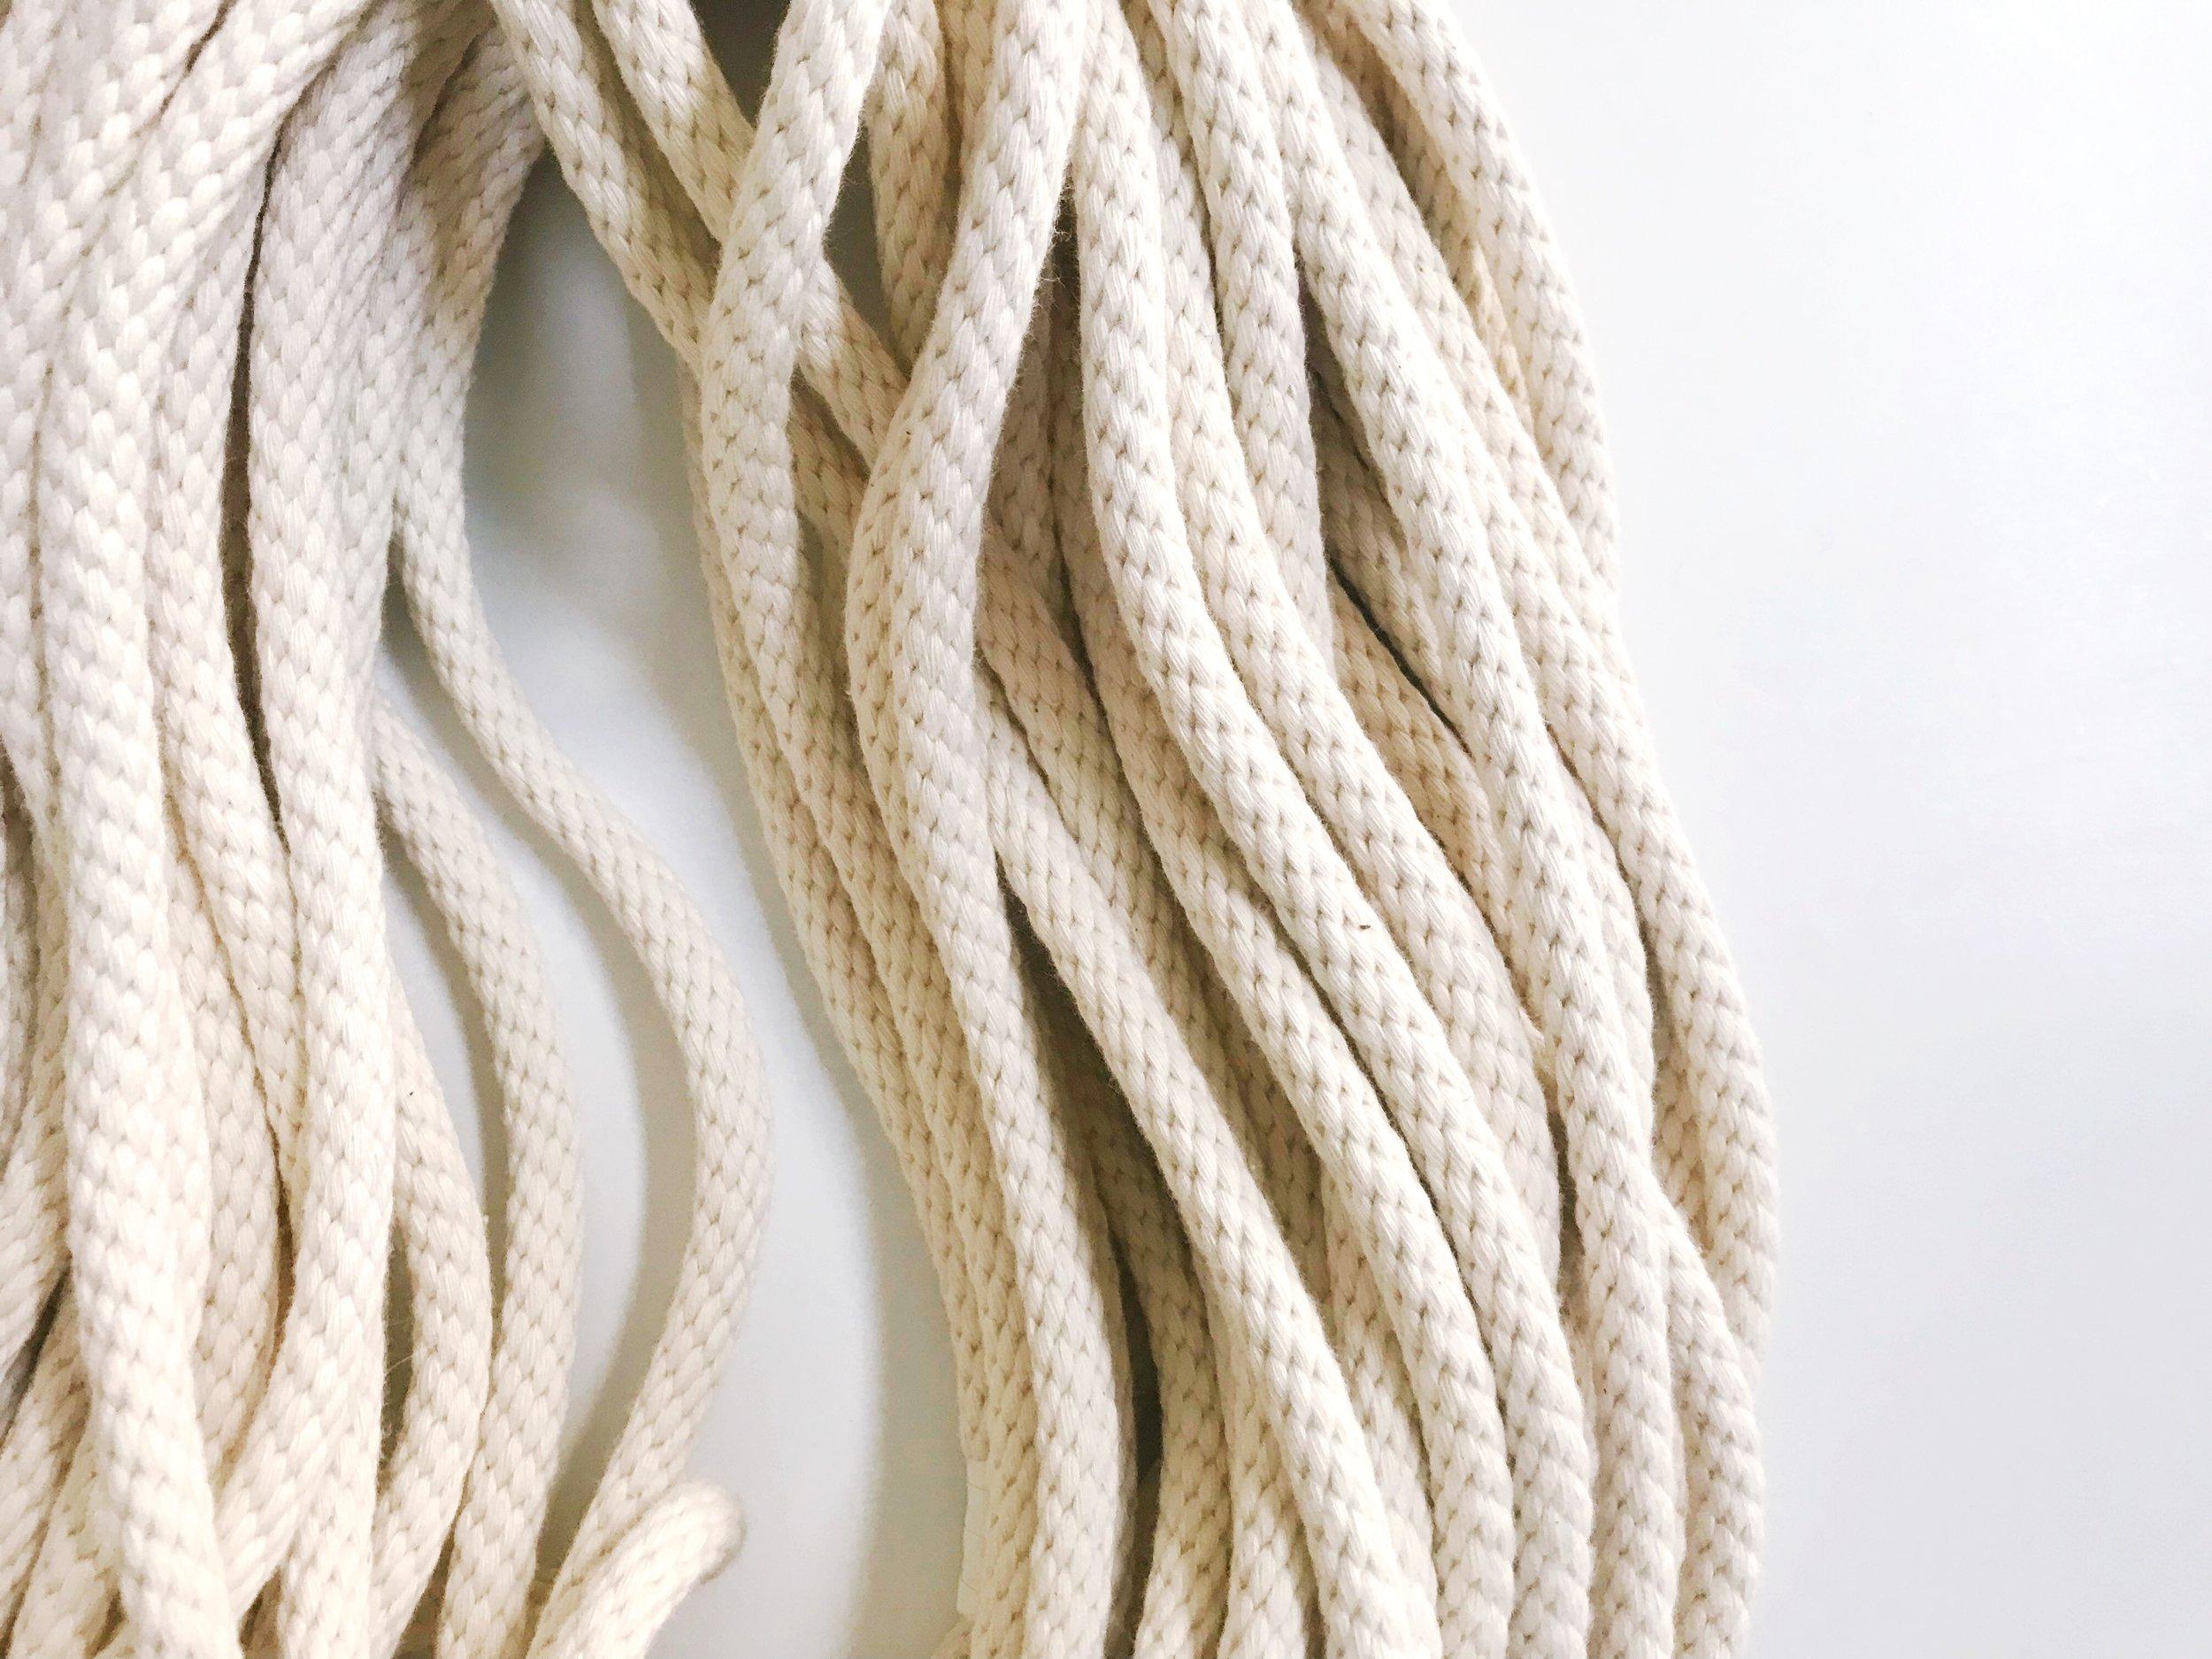 papercraftpantry-blog-diy-craft-fiber-necklace.jpg